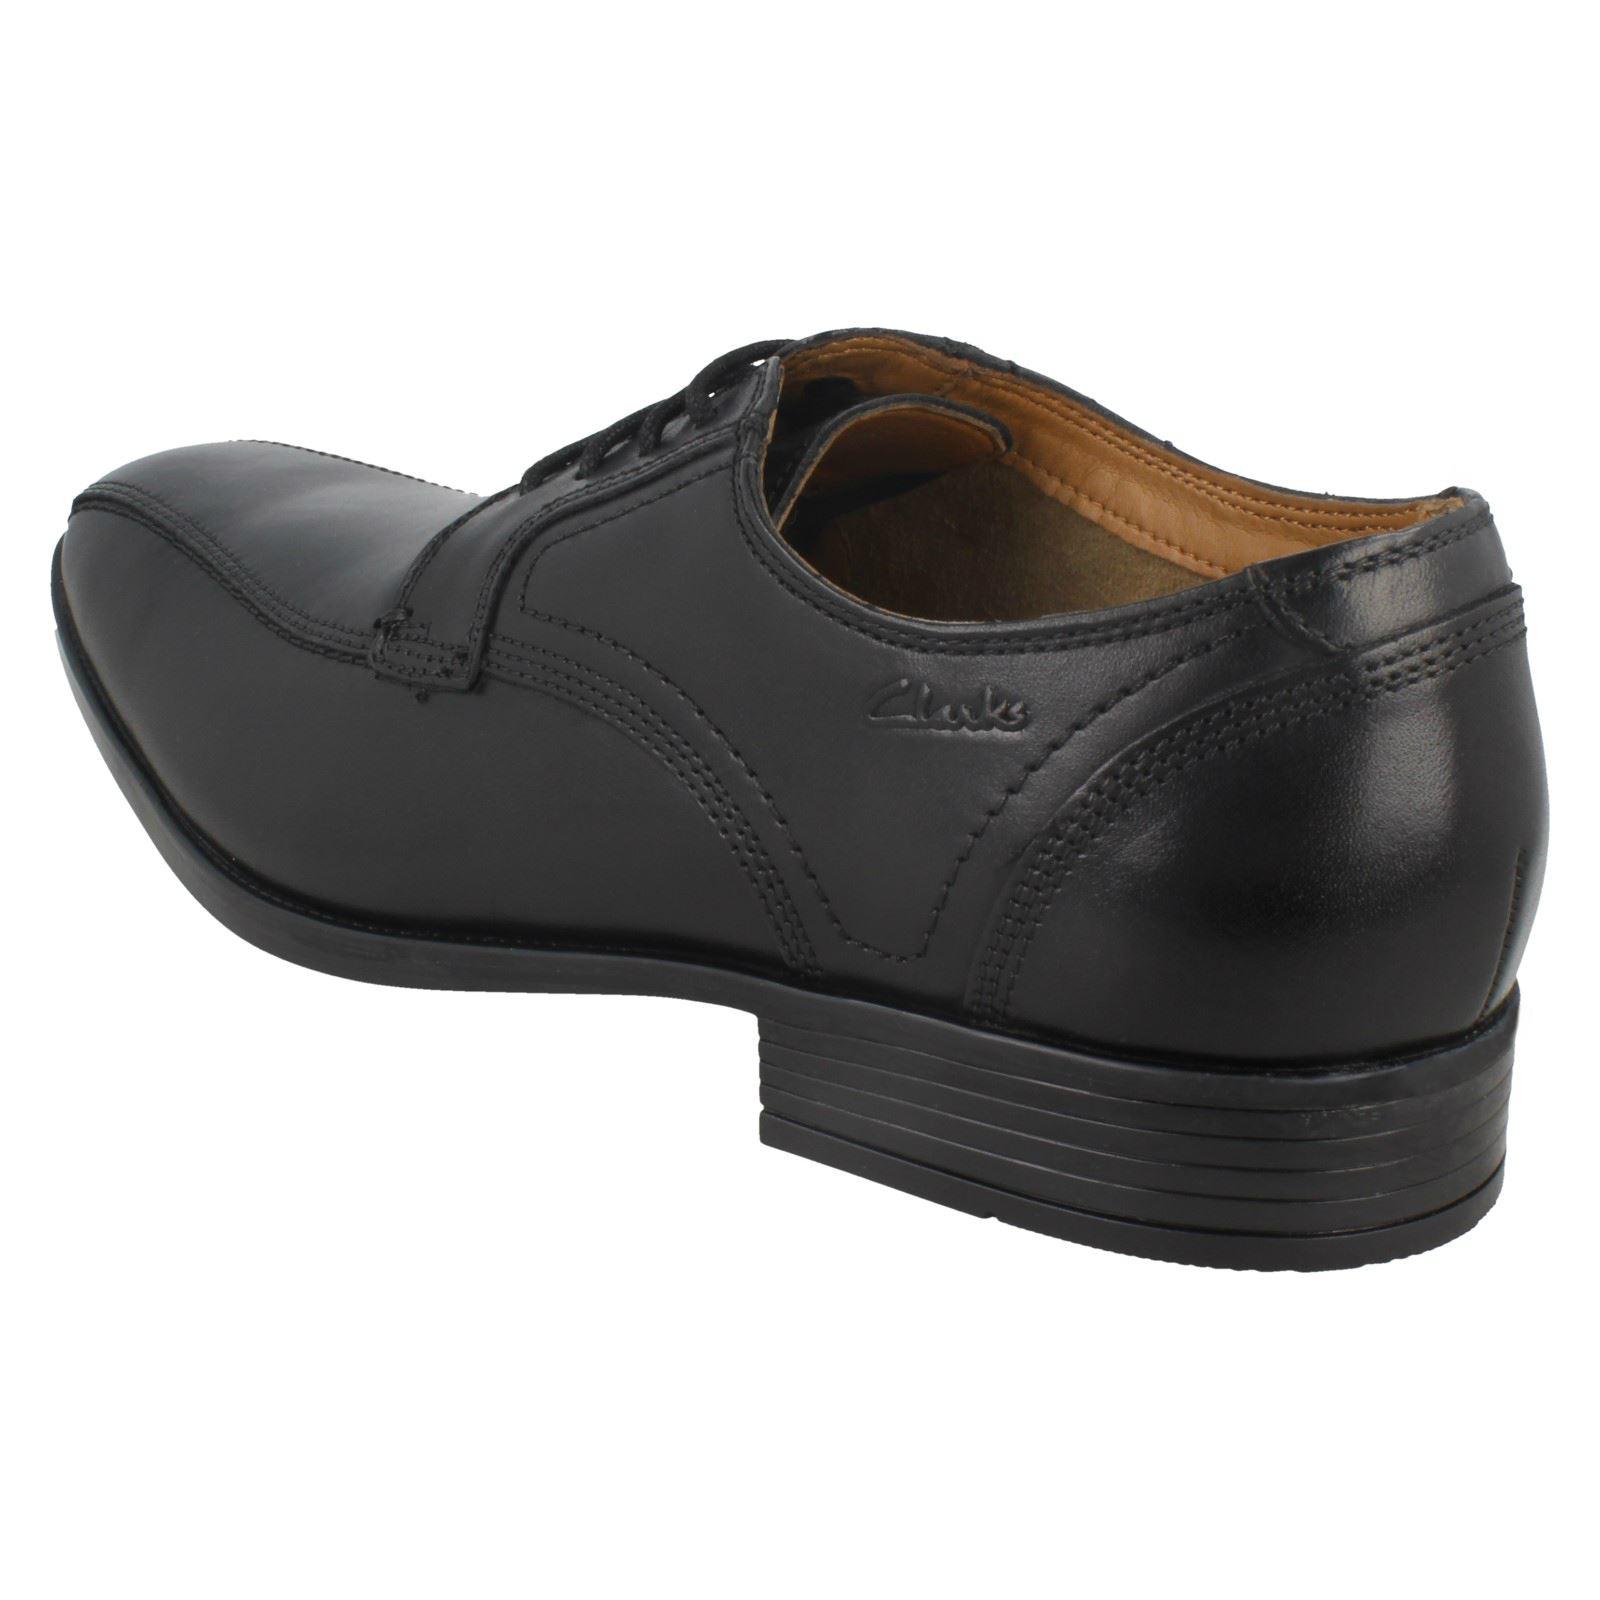 negro para Vibe con formales Kalden hombre Clarks cordones zapatos Paw7qp8nzx